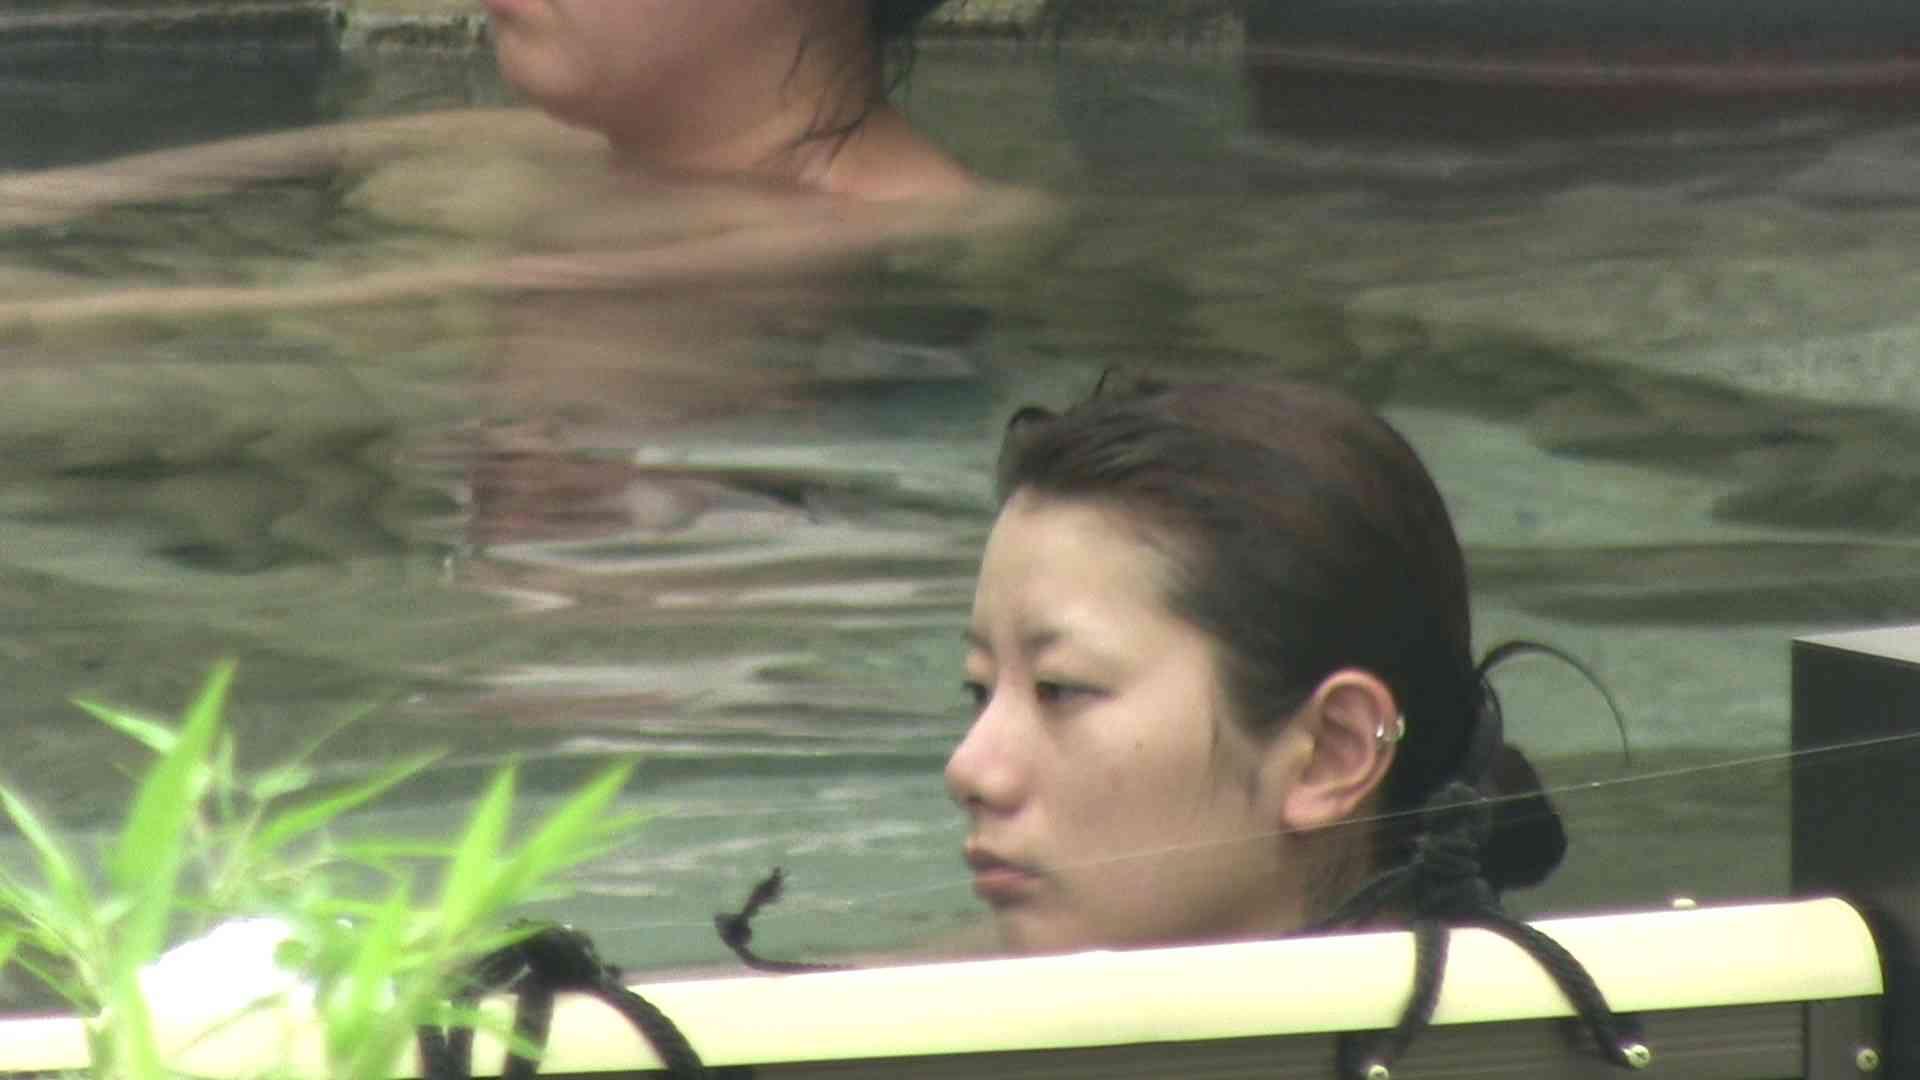 Aquaな露天風呂Vol.19【VIP】 盗撮 | HなOL  88pic 87